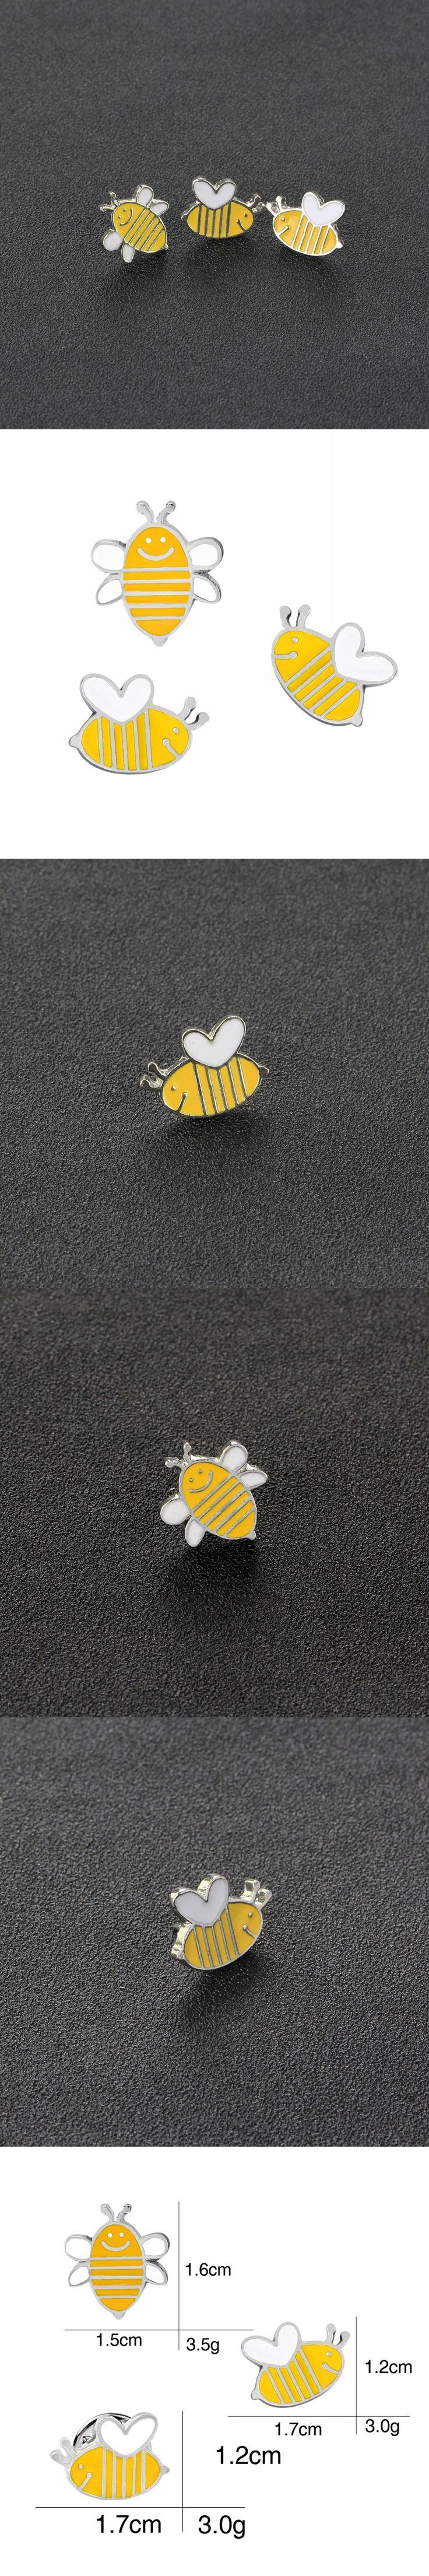 honeybee Pin Set white yellow bee pins and broches mini Cartoon hat bag badge Jewelry Brooches gift For children boys girls